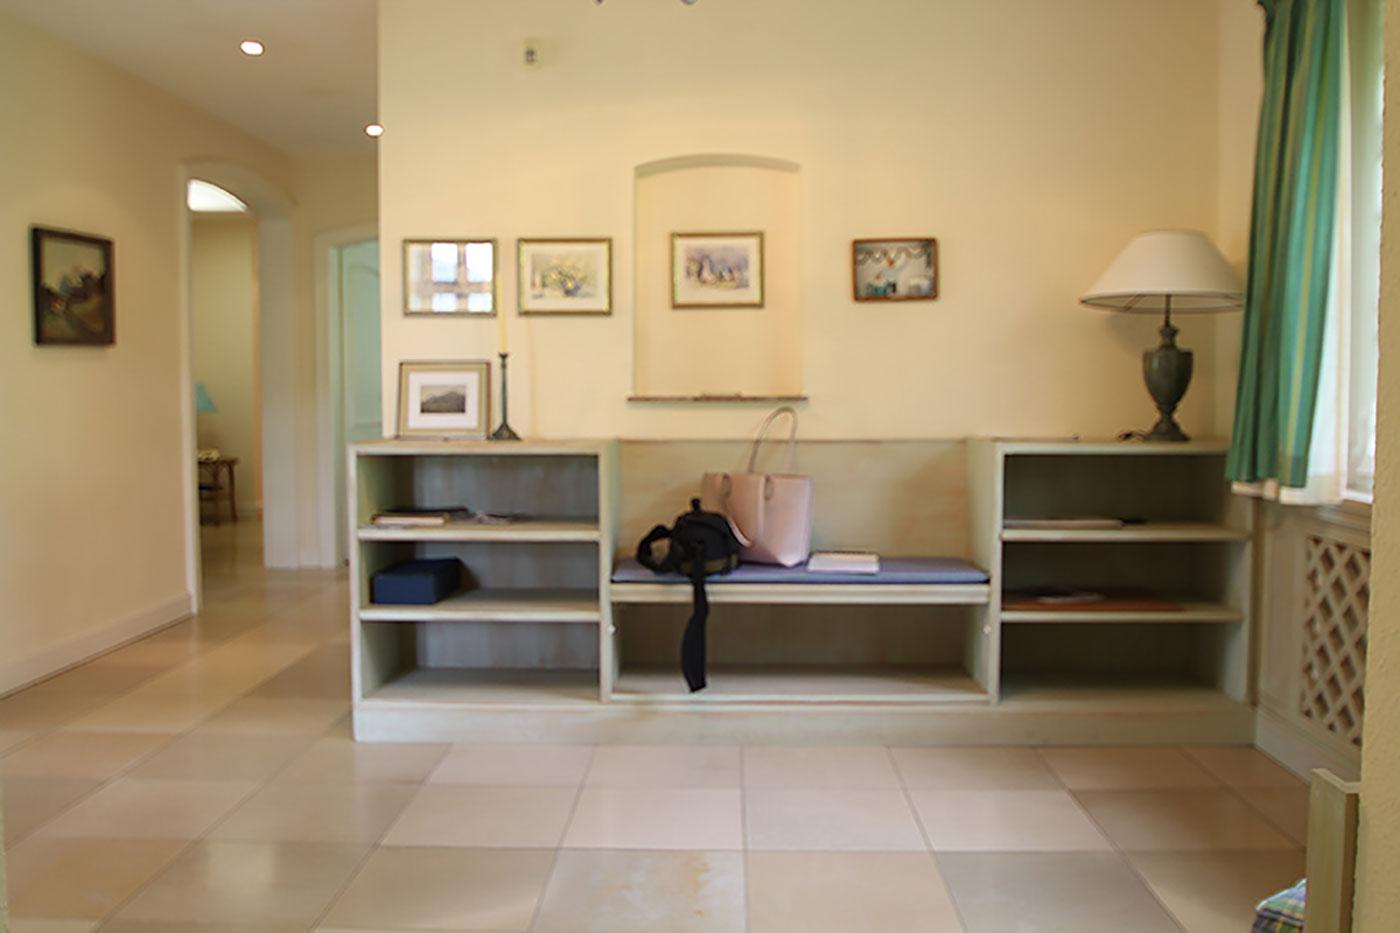 Vorher-Foto vom Flur und der Sitzbank | Blickfang Homestaging in Soest